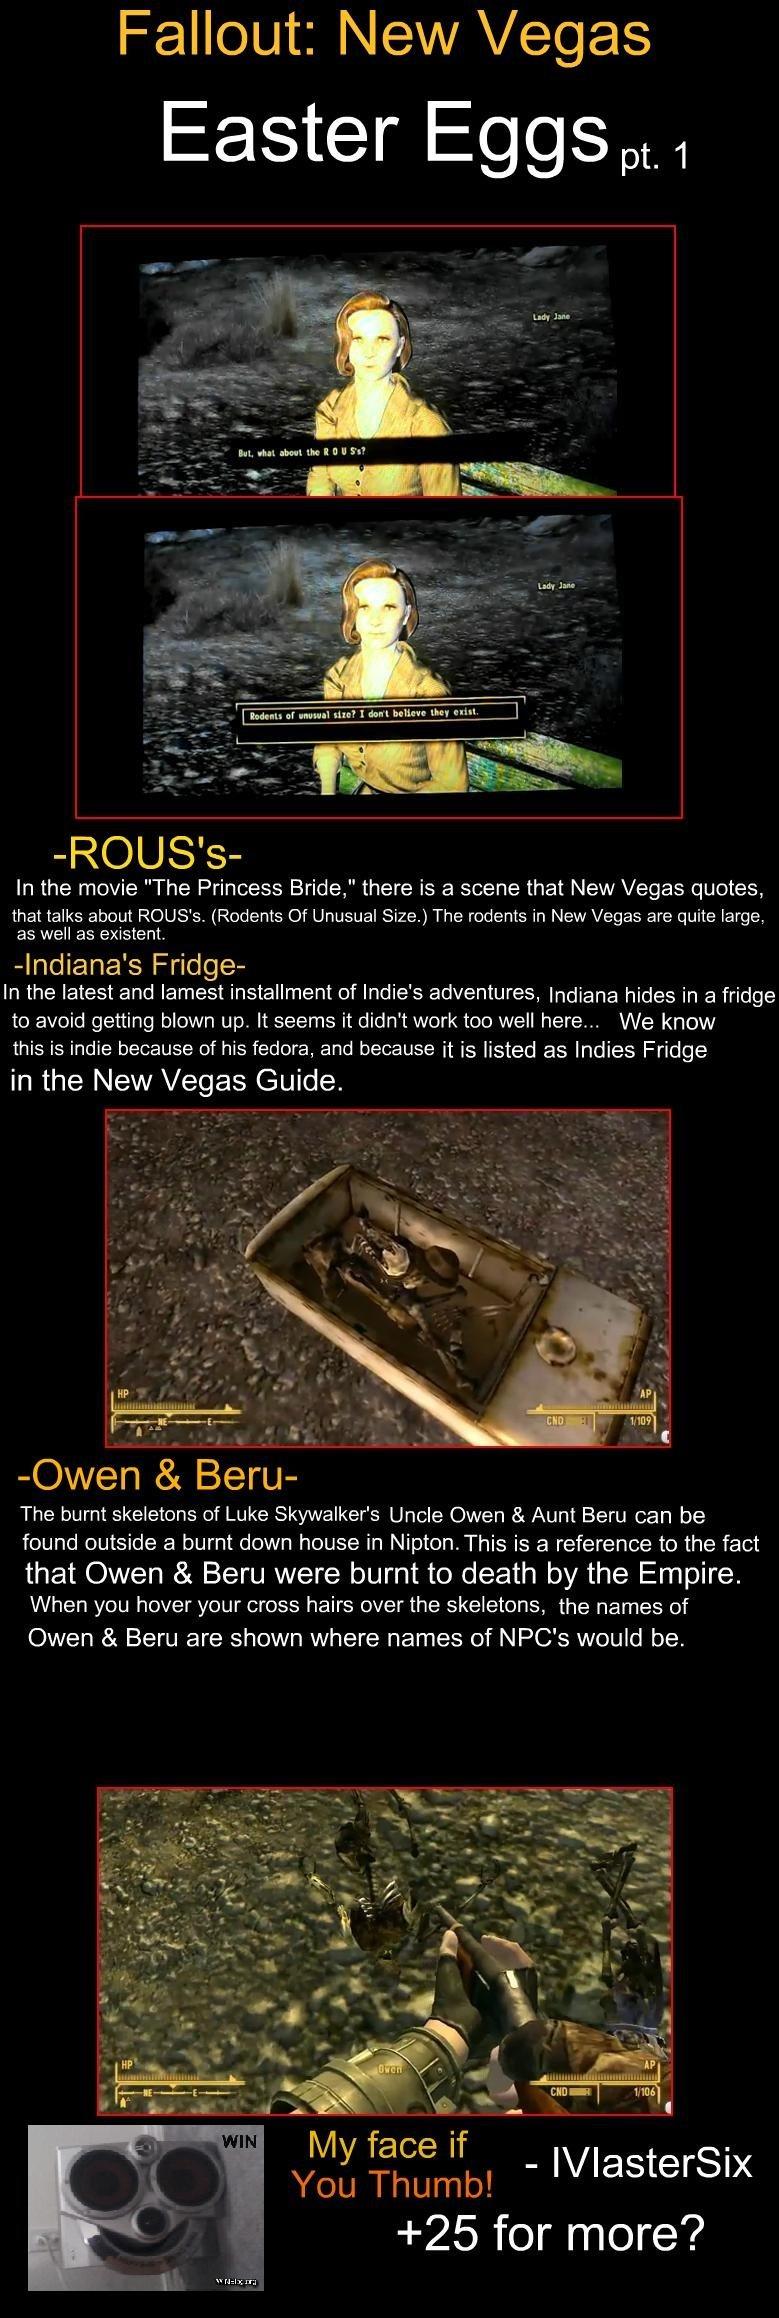 Fallout: New Vegas Easter Eggs Pt  1